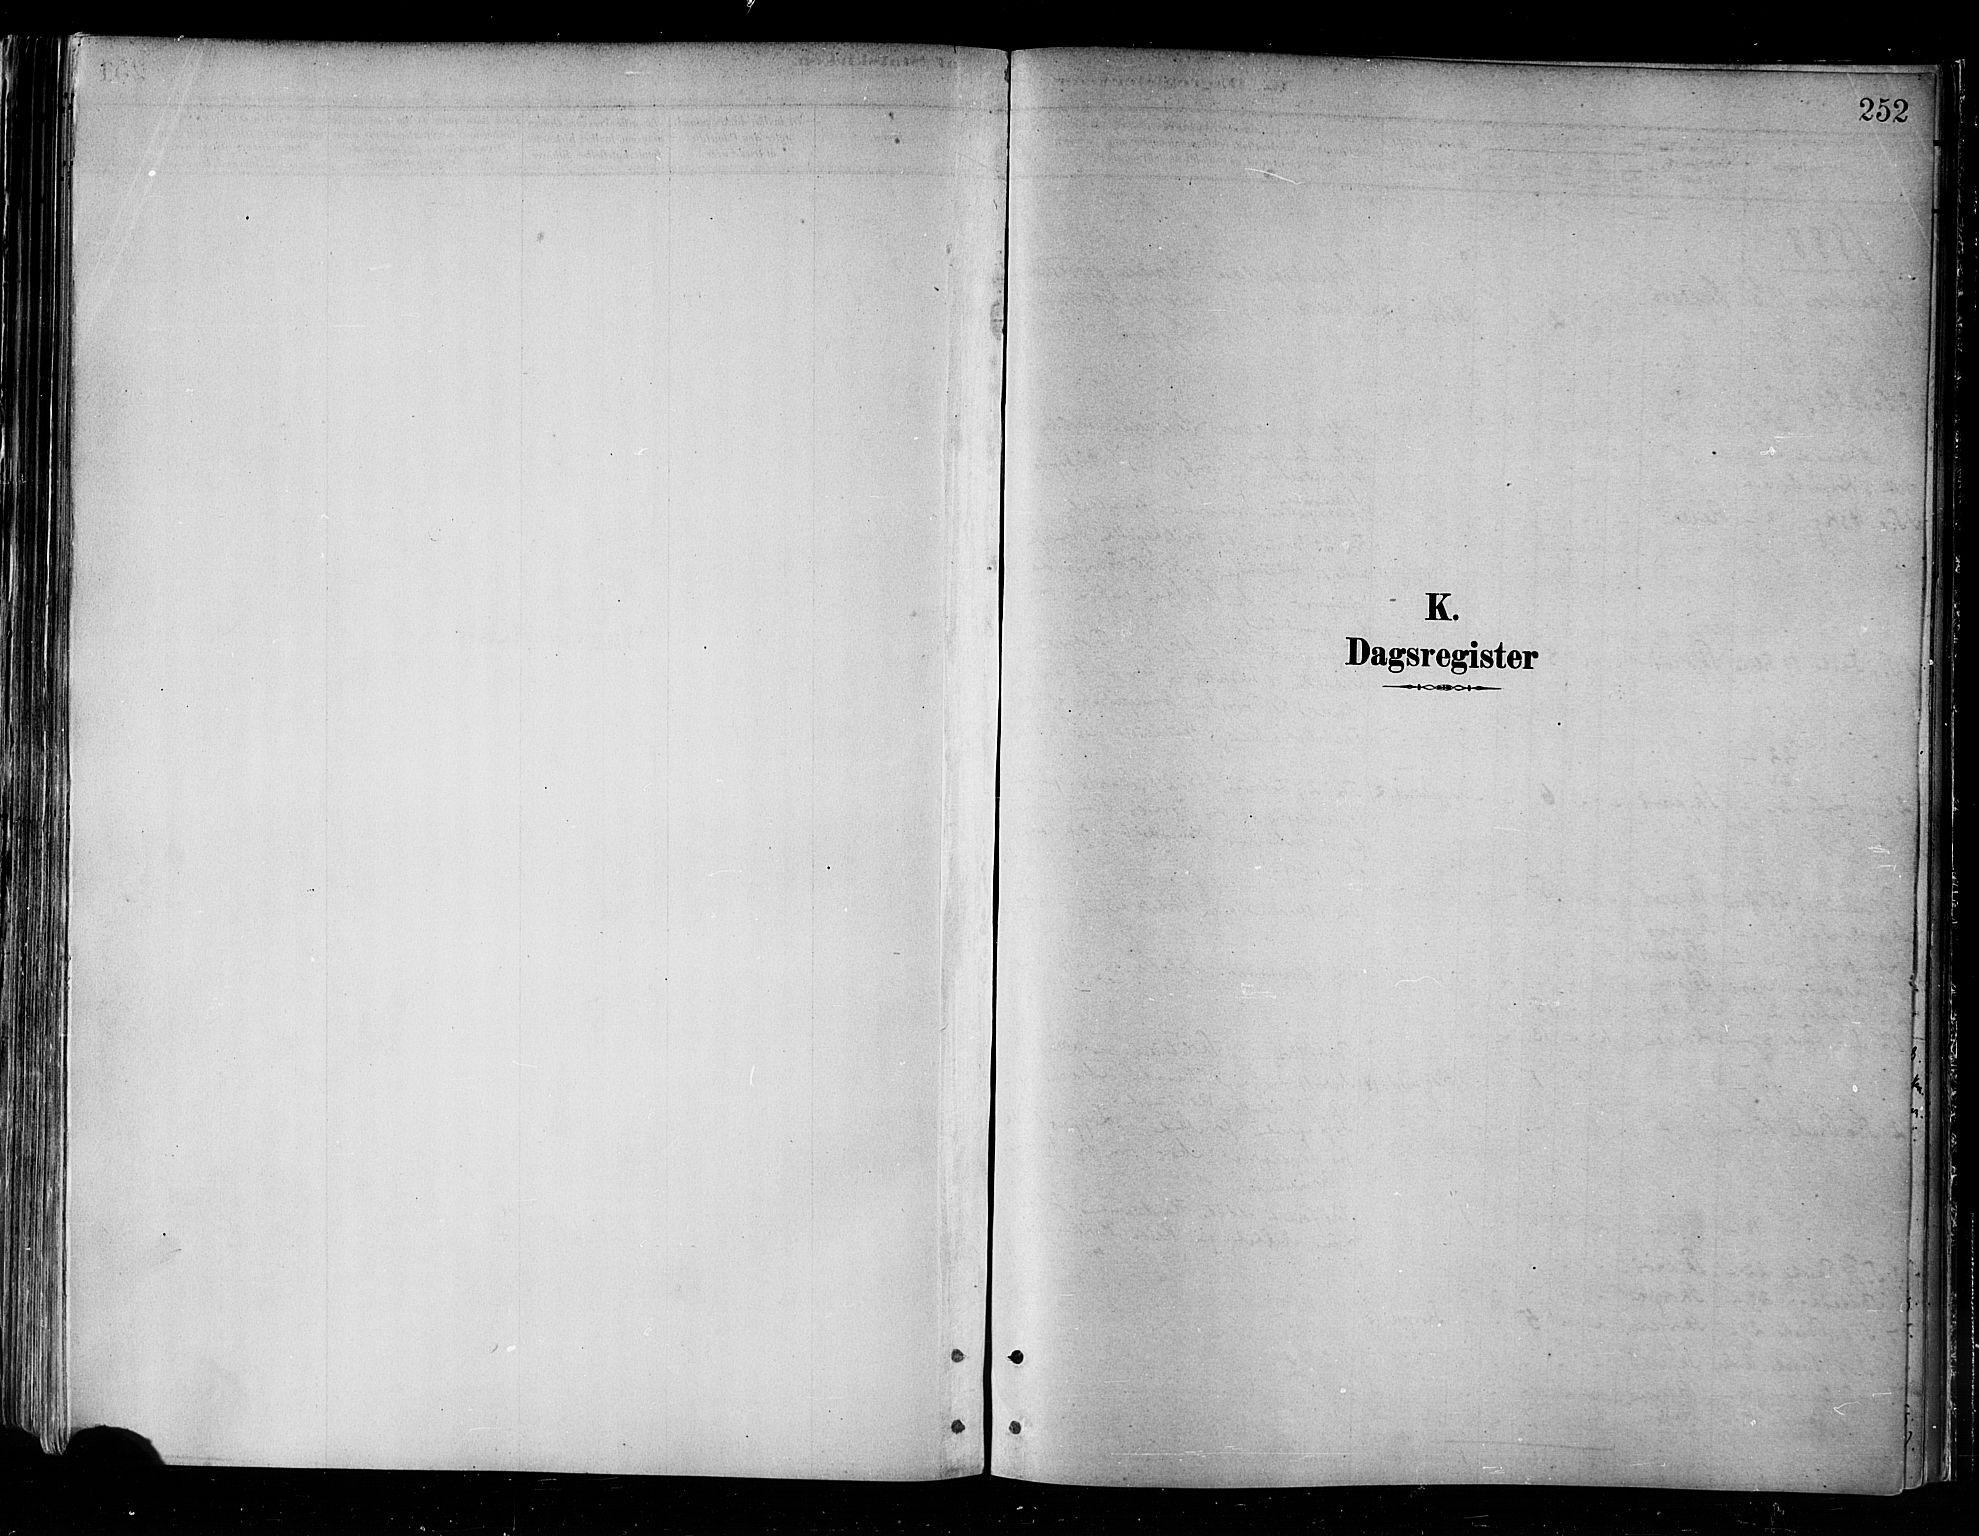 SATØ, Skjervøy sokneprestkontor, H/Ha/Haa/L0010kirke: Ministerialbok nr. 10, 1887-1898, s. 252